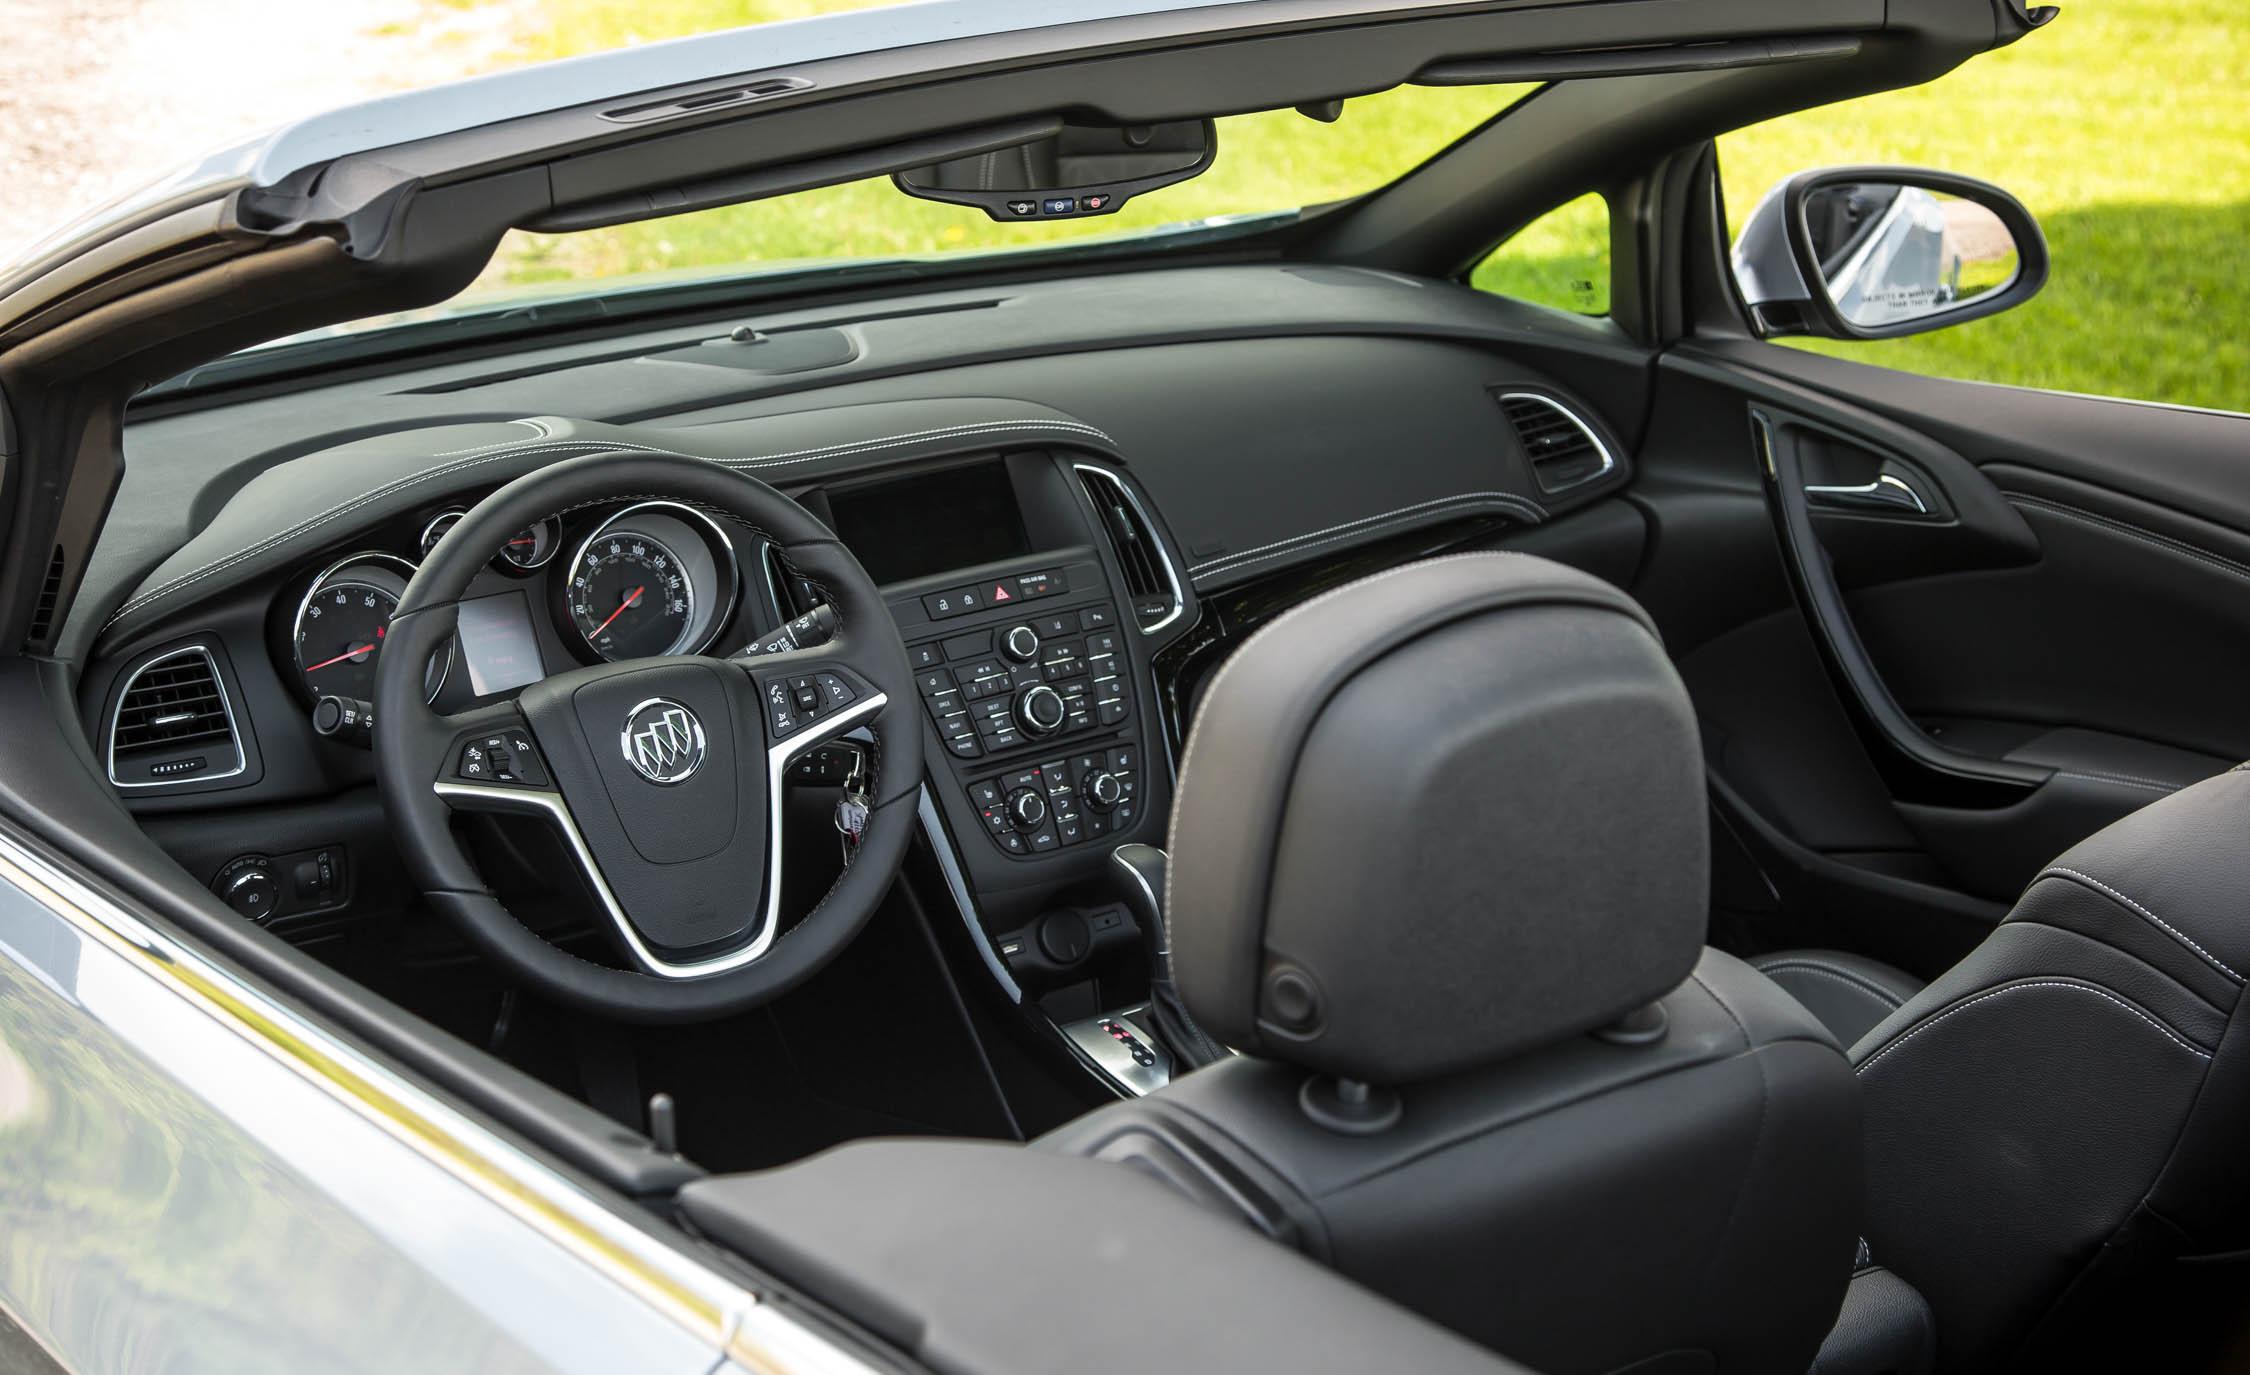 2016 Buick Cascada Premium (View 5 of 24)